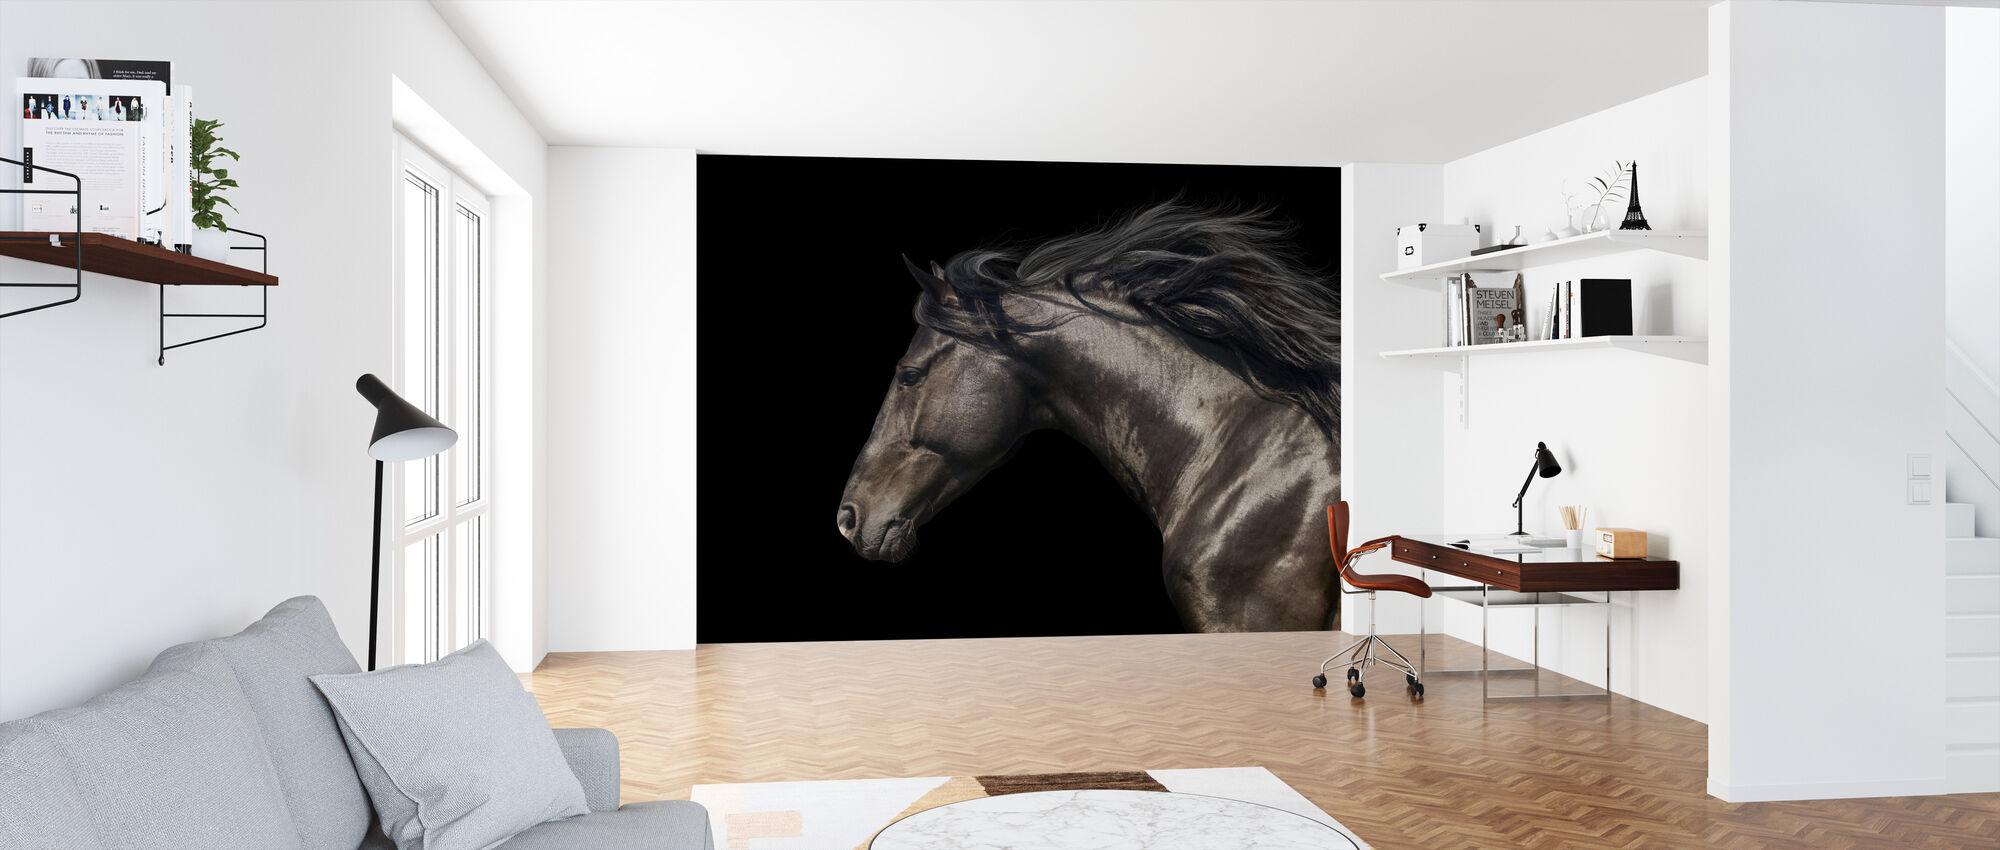 Black Horse - Wallpaper - Office